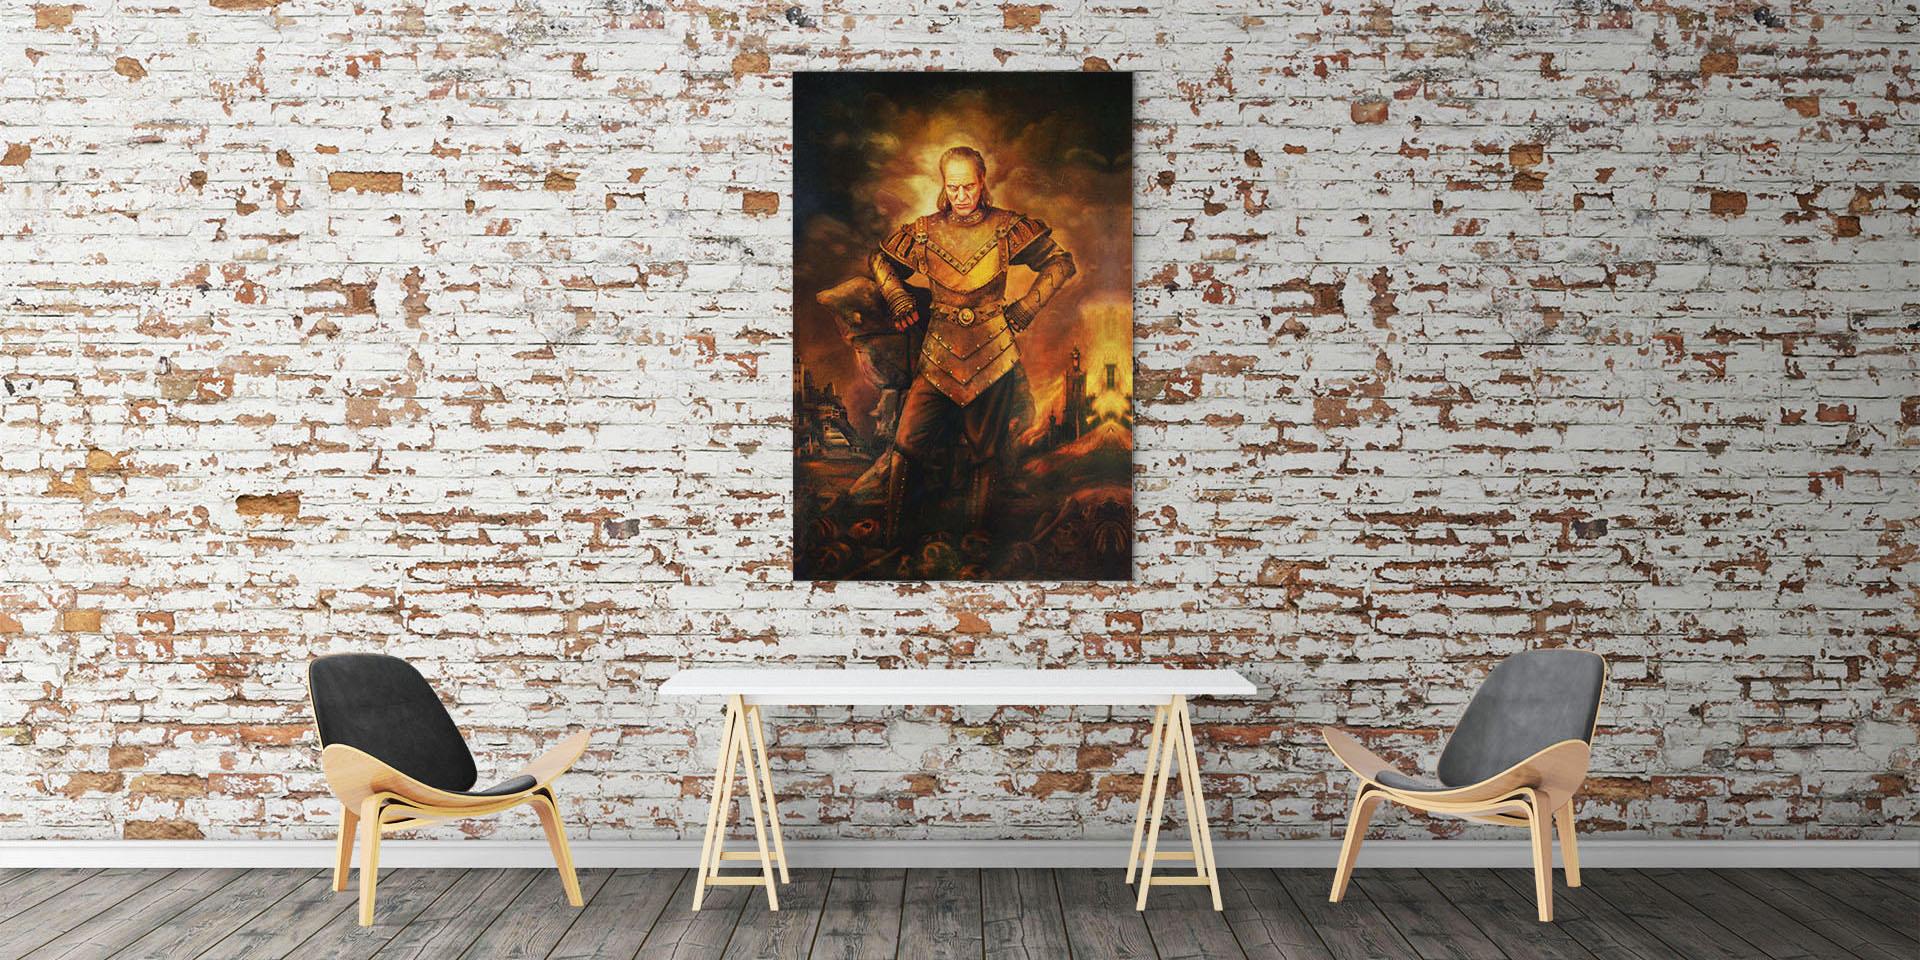 Vigo the Carpathian Framed Canvas Replica Print from Ghostbusters II